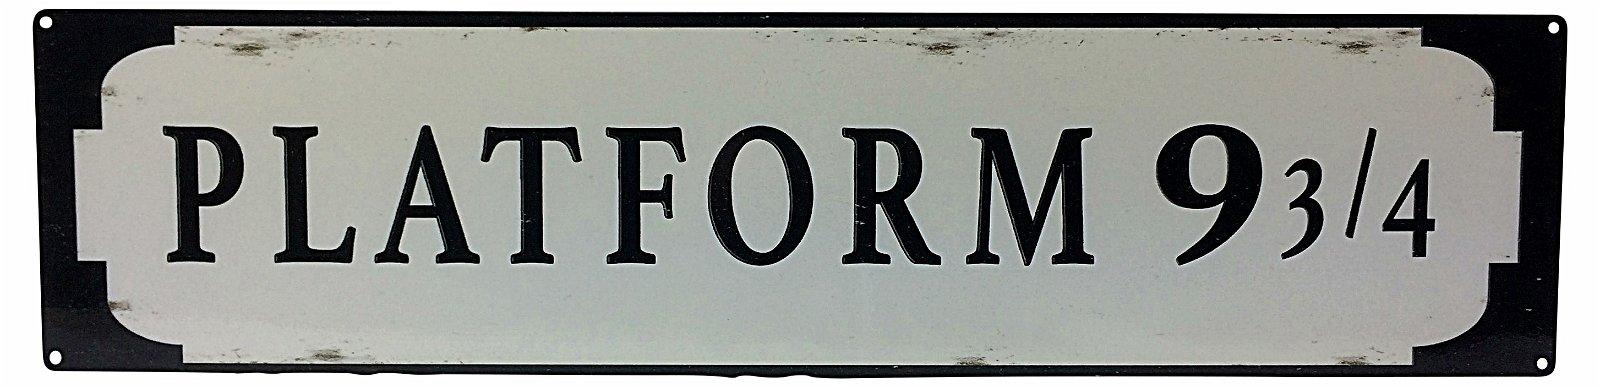 Metal Street Sign PLATFORM 9 3/4 70cm x 17cm